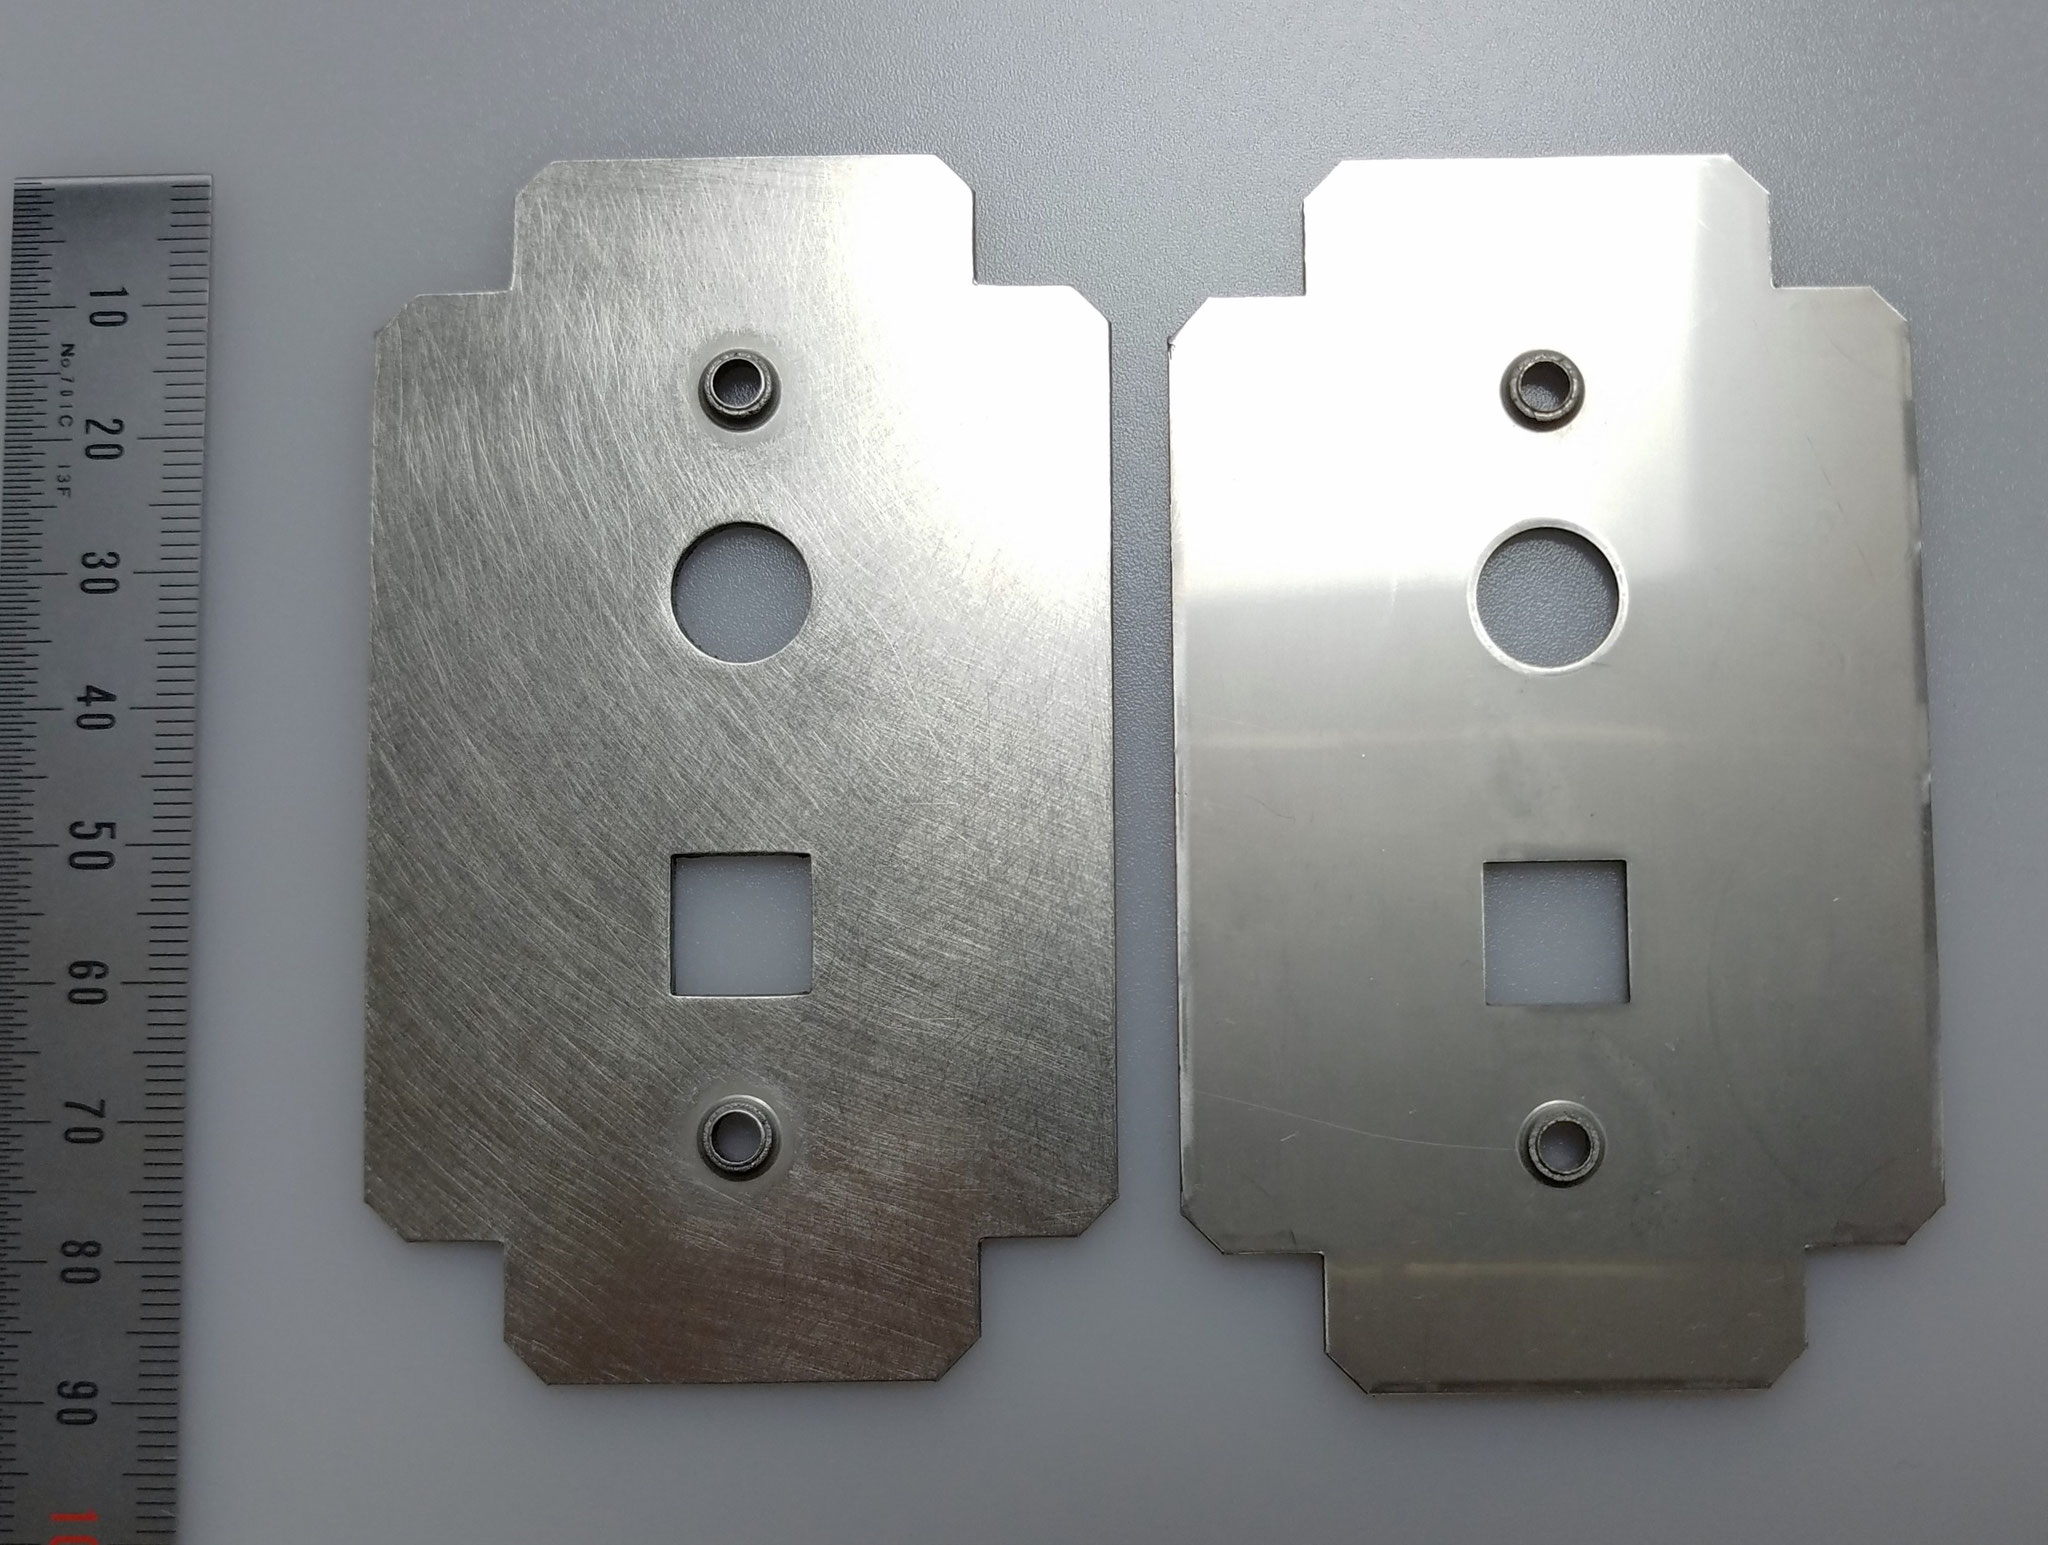 SUS304 t=1.5㎜ スマートフレックスディスクにてバーリング有製品も加工可能。